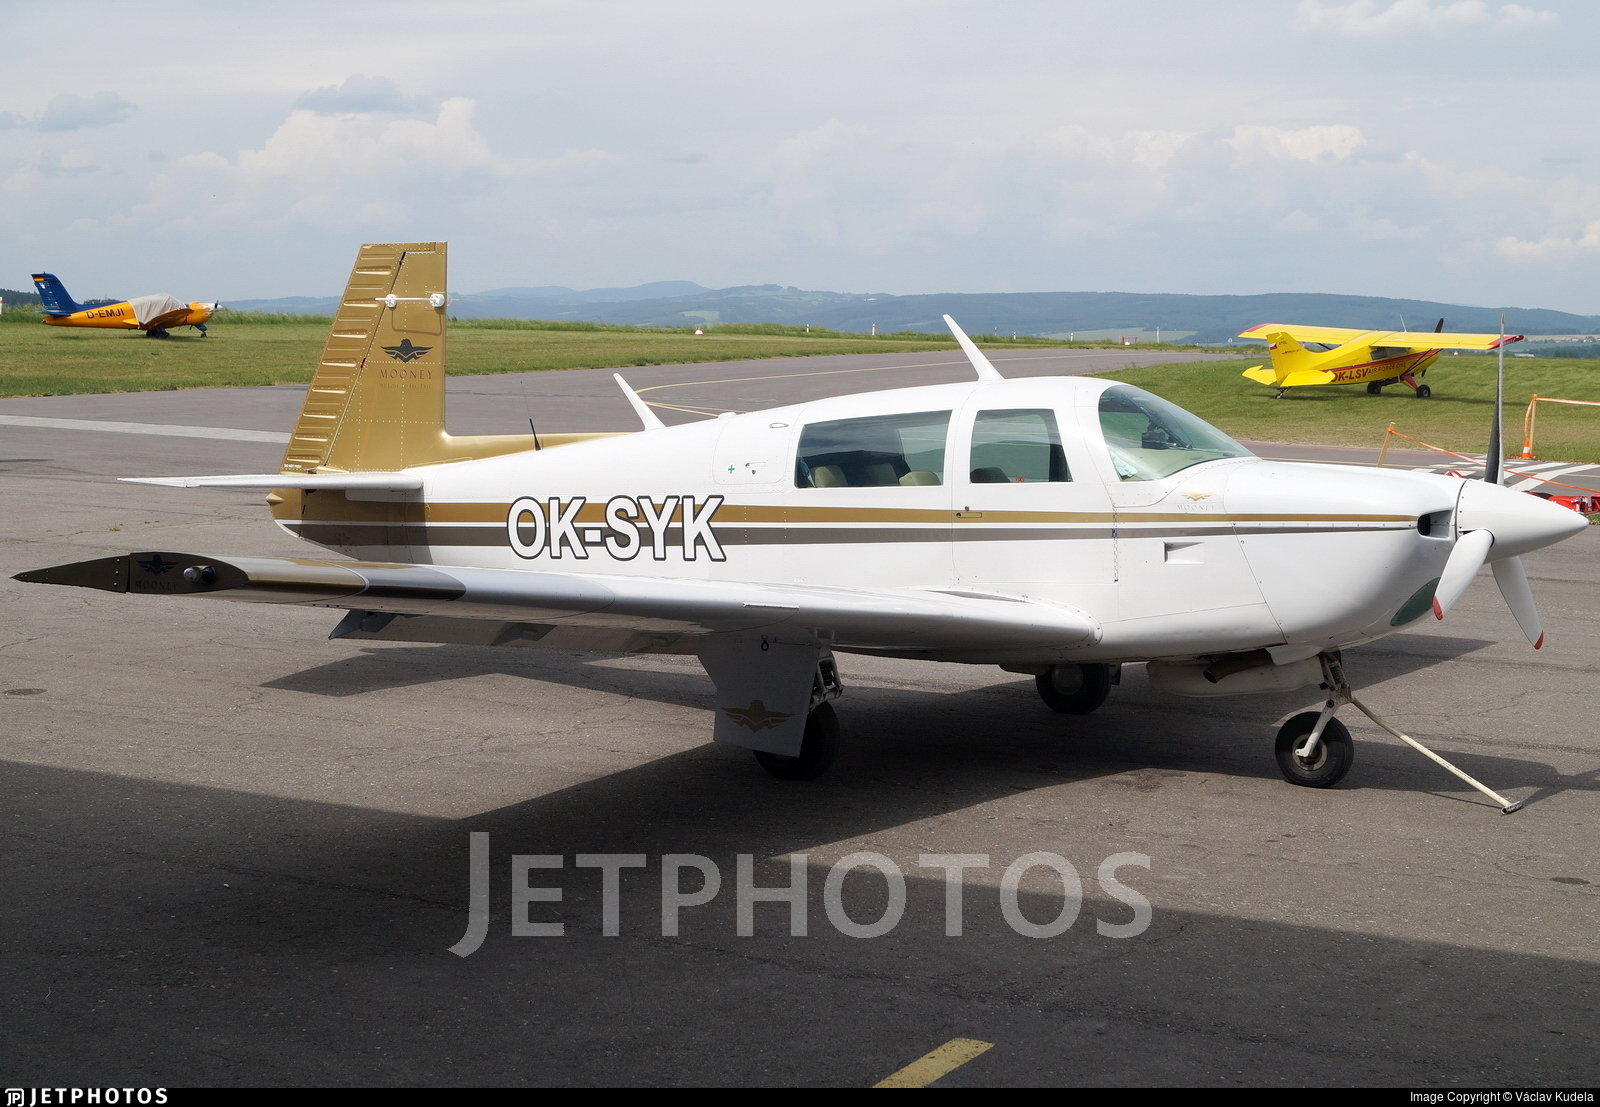 OK-SYK - Mooney M20J-201 - Private